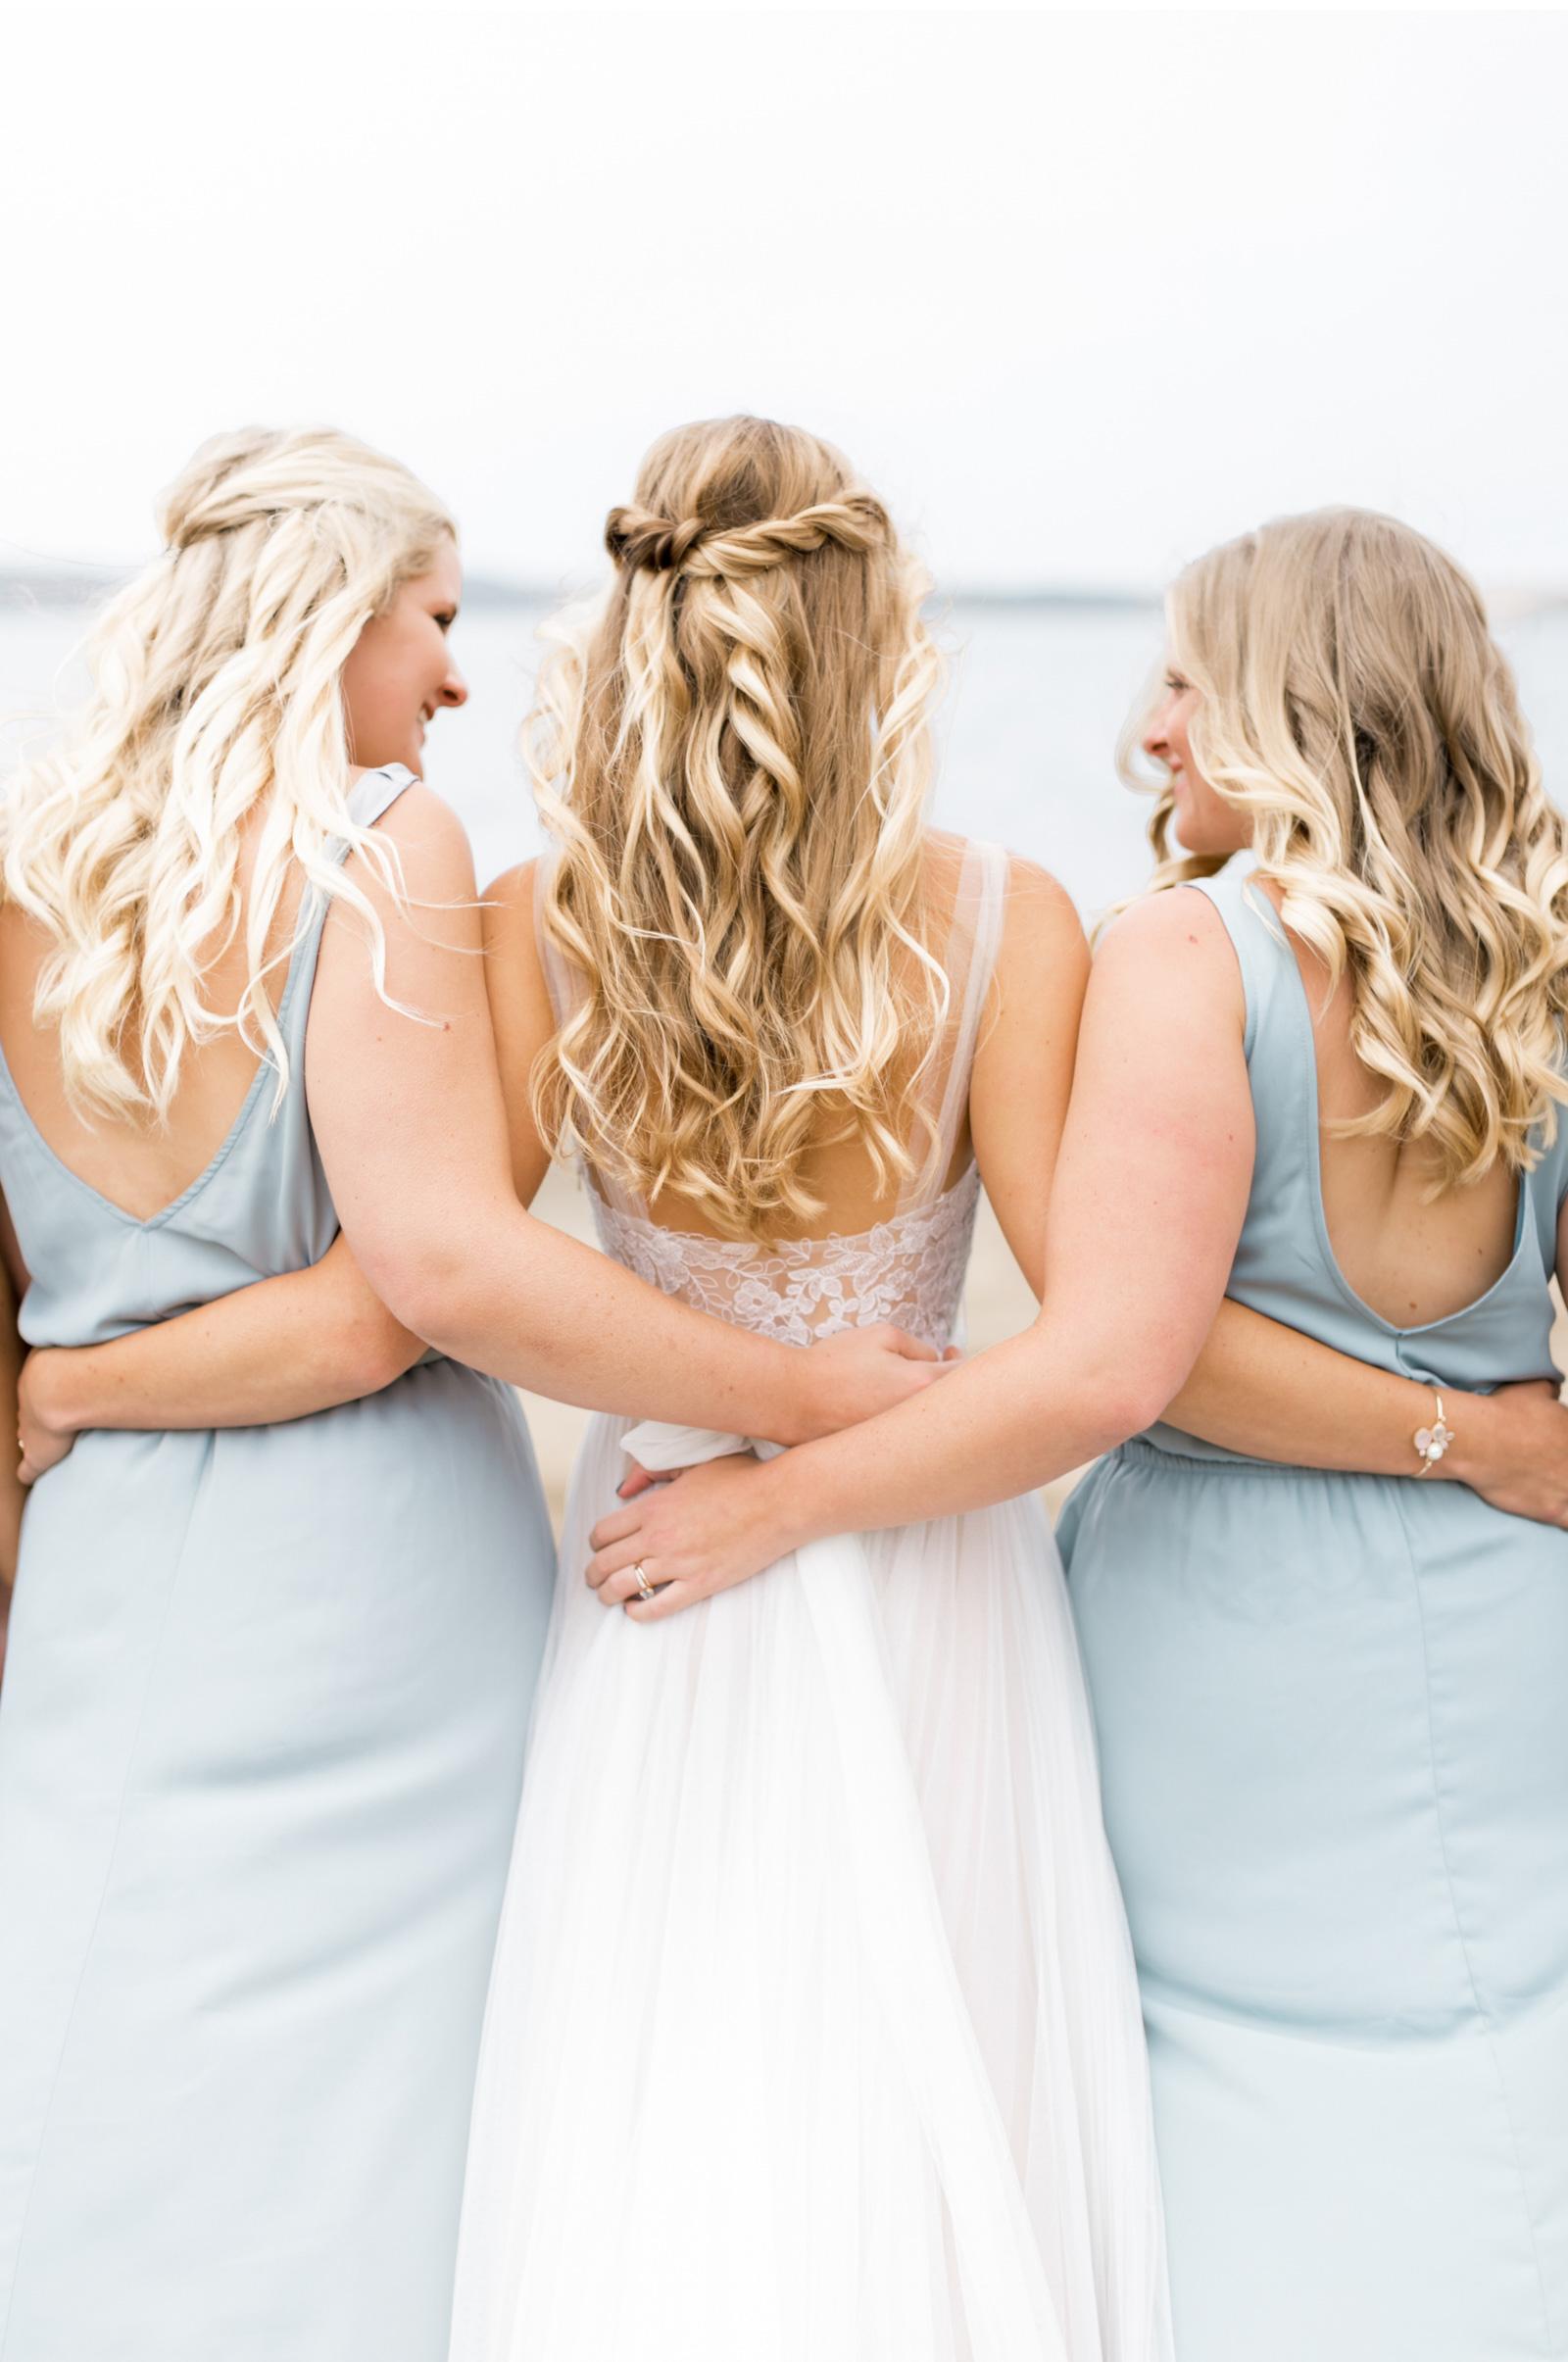 San-Luis-Obispo-Wedding-Show-Me-Your-Mumu-Natalie-Schutt-Photography_01.jpg